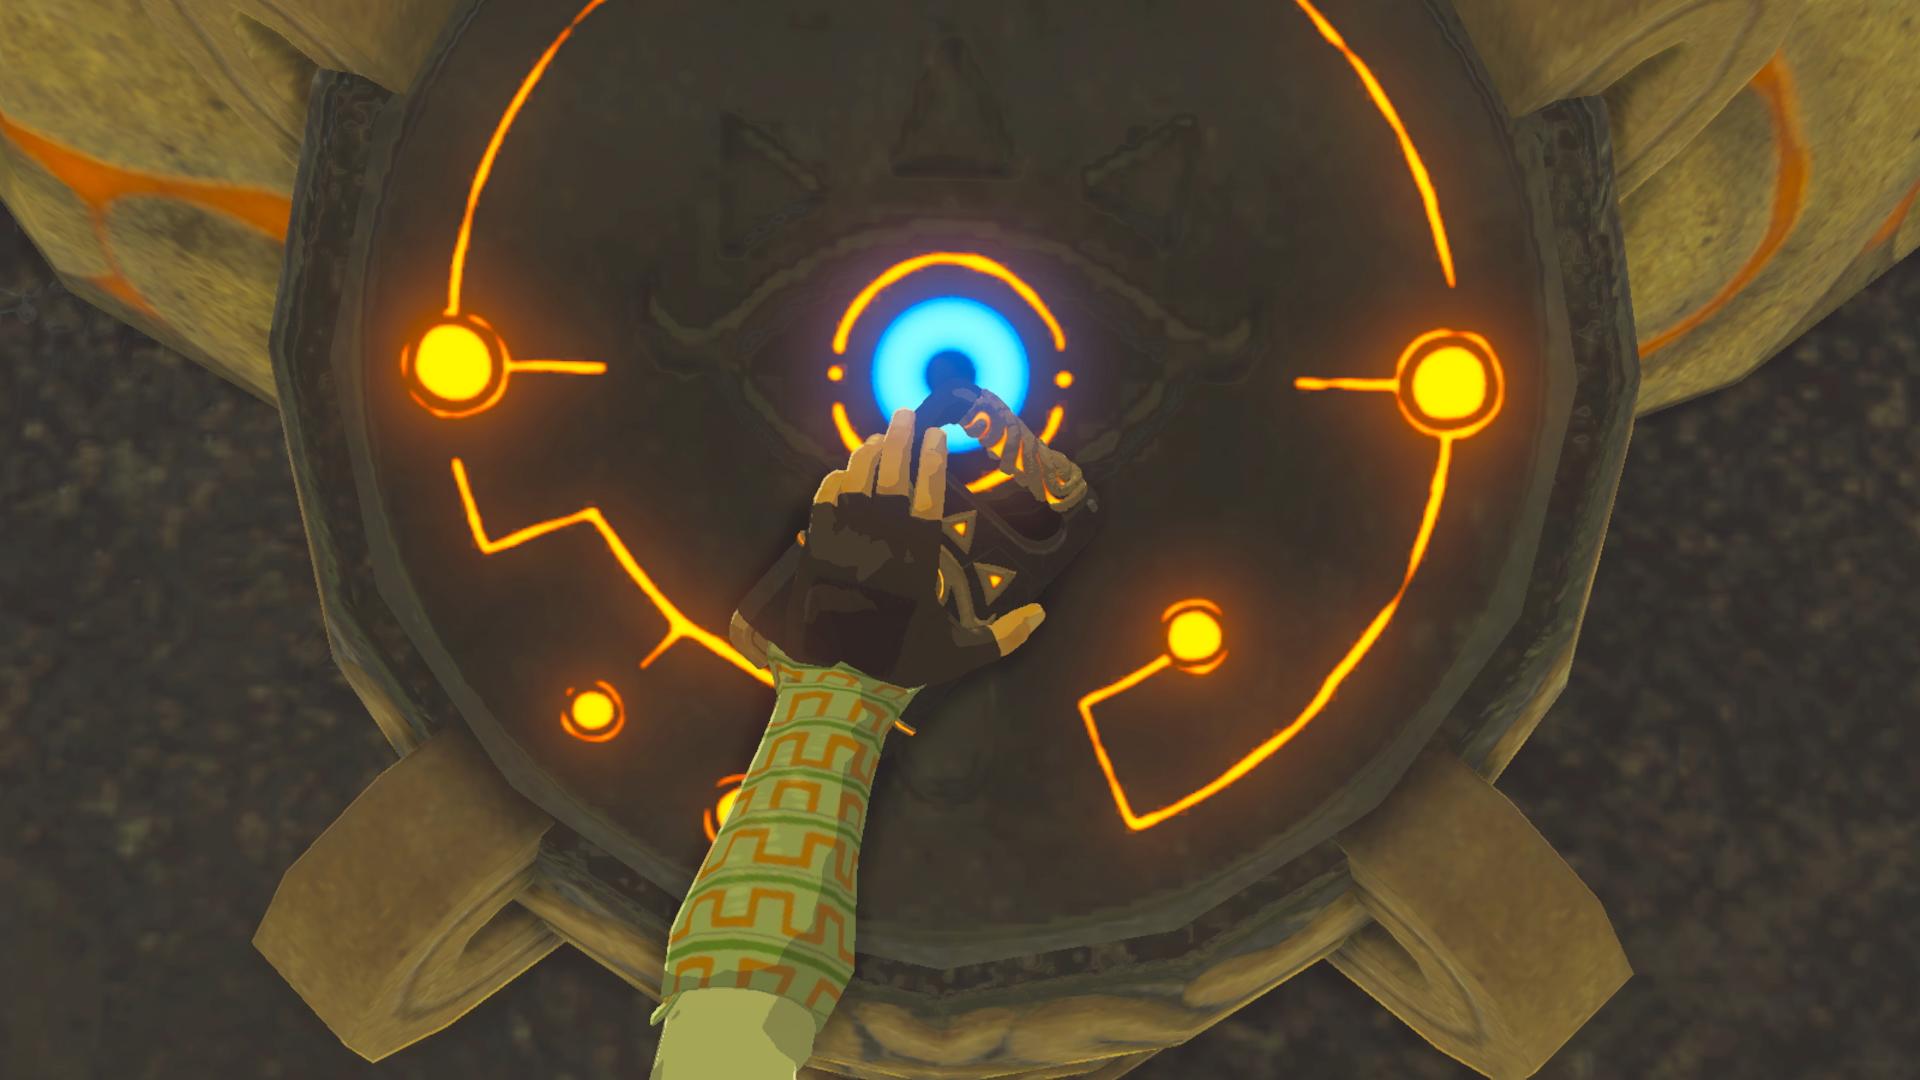 The Legend of Zelda: Breath of the Wild image 26